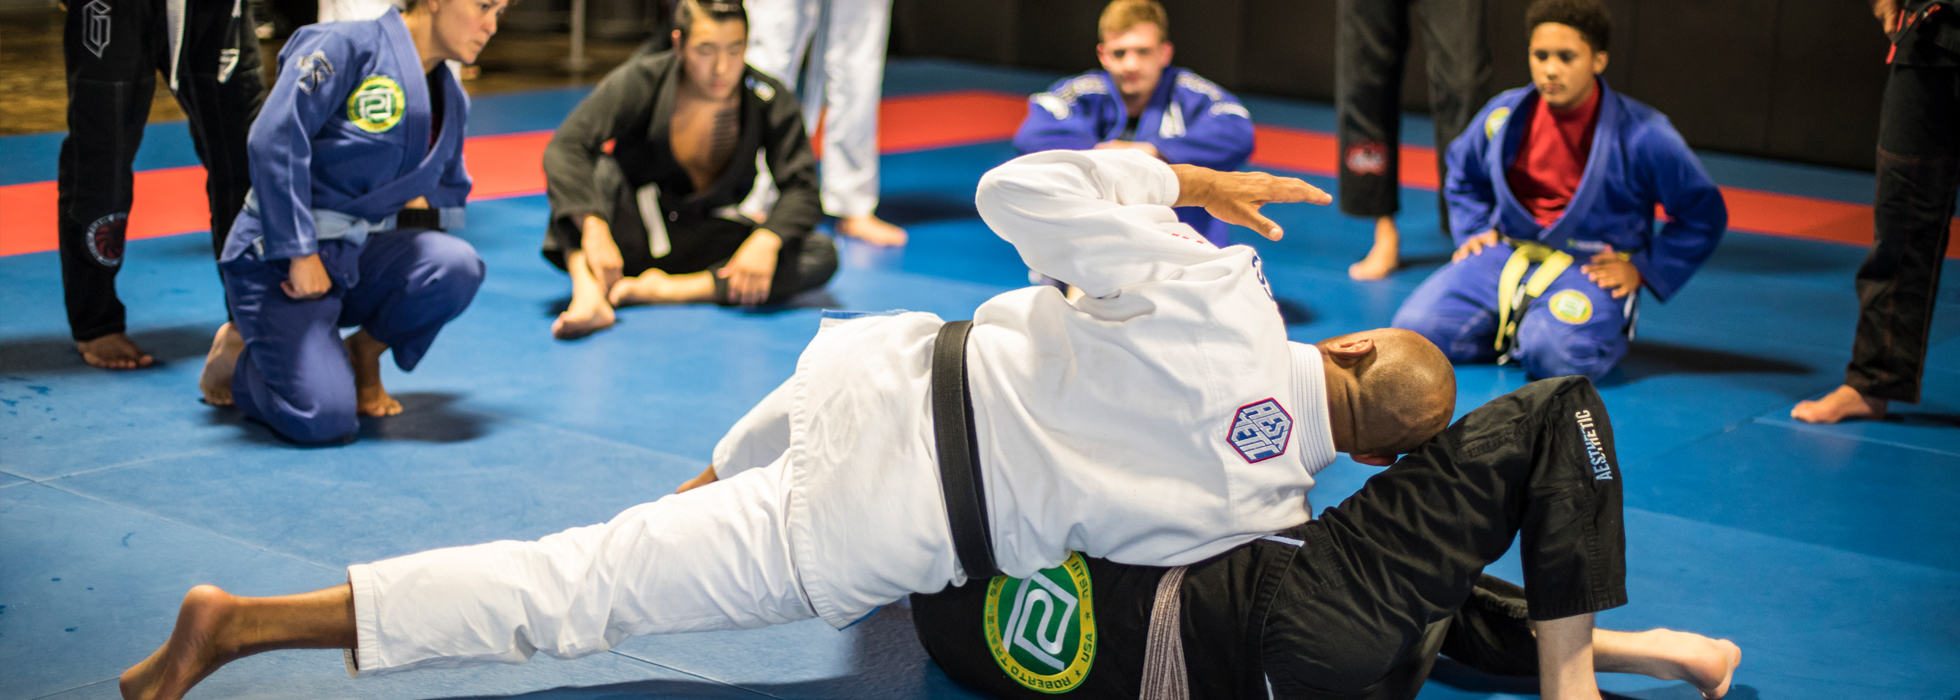 Brazilian Jiu-Jitsu Training near Atlanta GA, Brazilian Jiu-Jitsu Training near Cartersville GA, Brazilian Jiu-Jitsu Training near Chamblee GA, Brazilian Jiu-Jitsu Training near Midtown Atlanta GA, Brazilian Jiu-Jitsu Training near Sandy Springs GA, Brazilian Jiu-Jitsu Training near Dacula GA